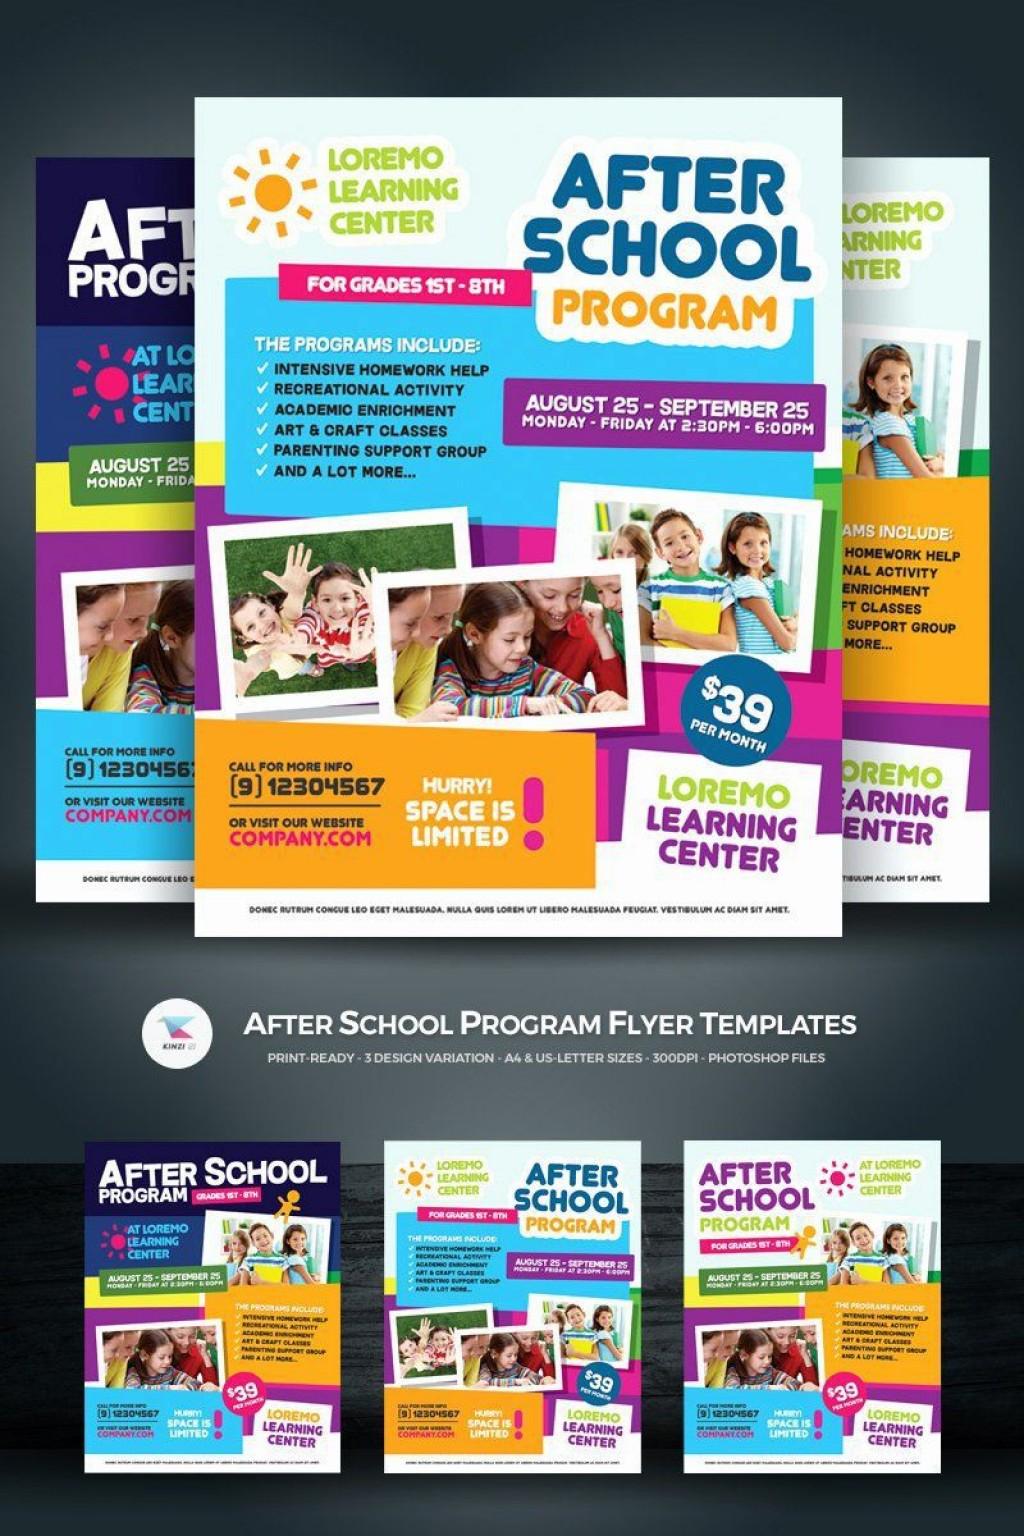 002 Stirring Free After School Program Flyer Template Idea Large